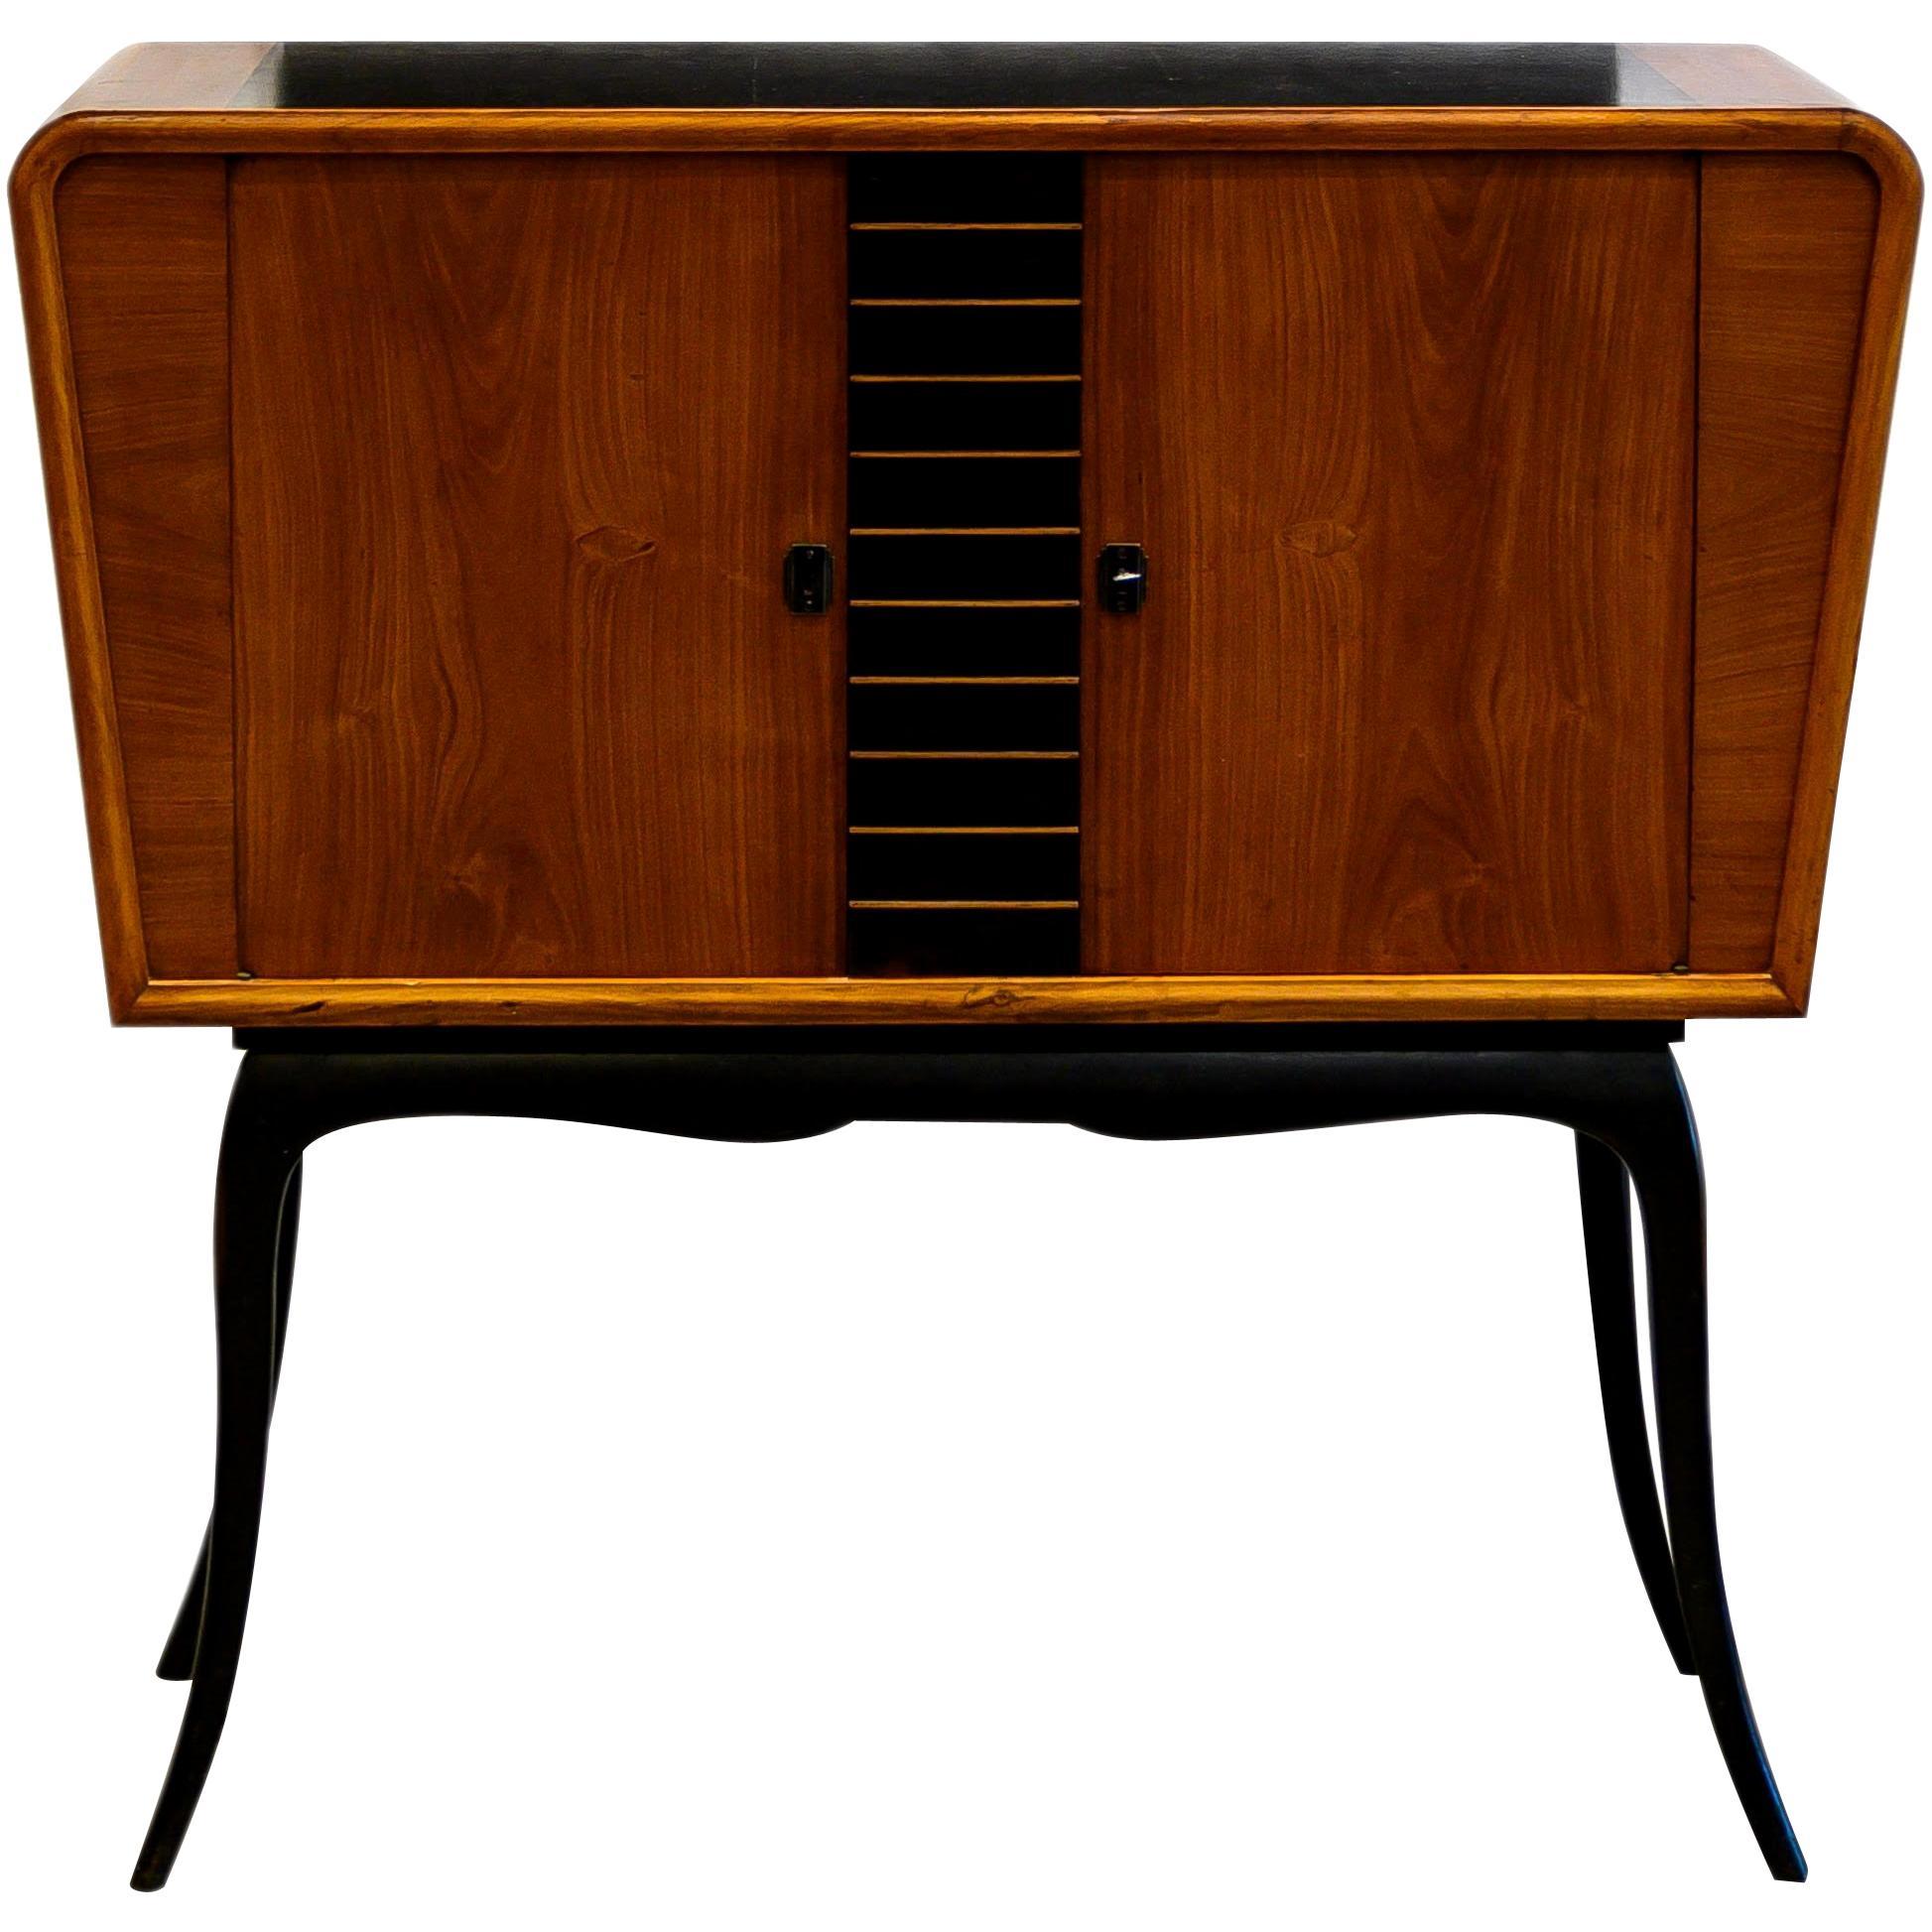 Guiseppi Scapinelli Brazilian Wood Bar Cabinet, circa 1960s